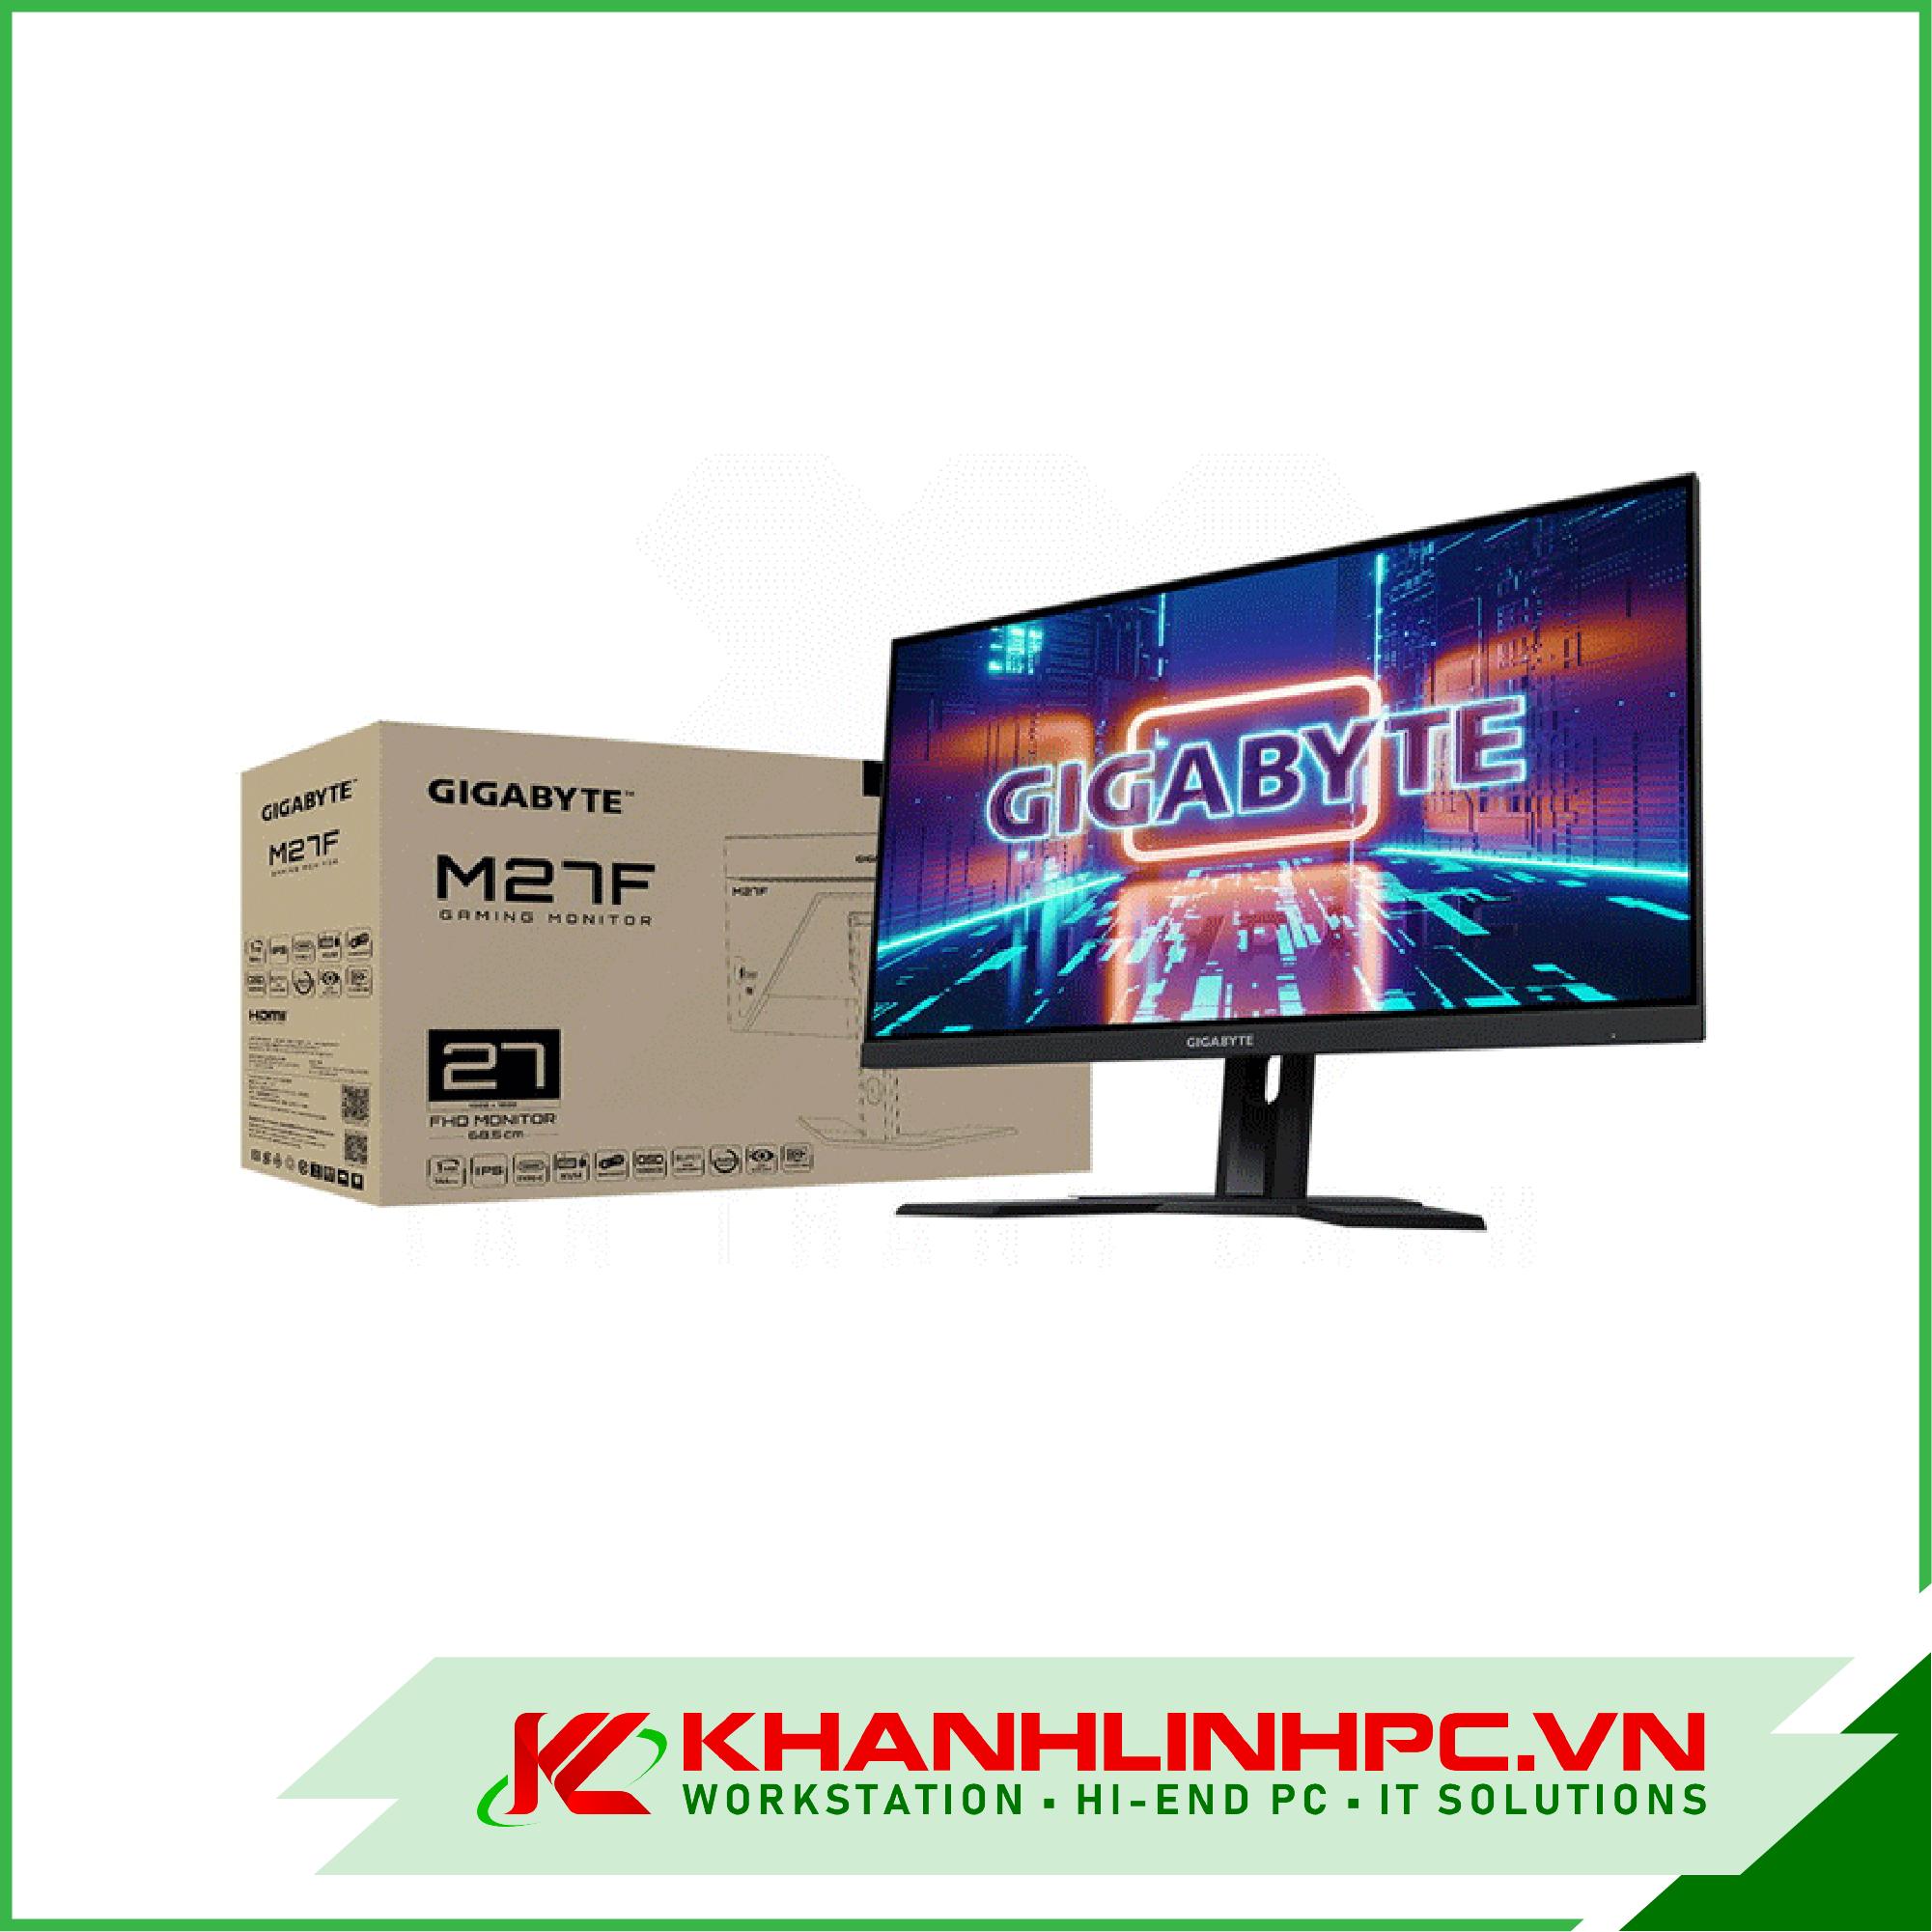 LCD GIGABYTE M27F-EK 27 Inches FHD IPS 144MHZ Chuyên game